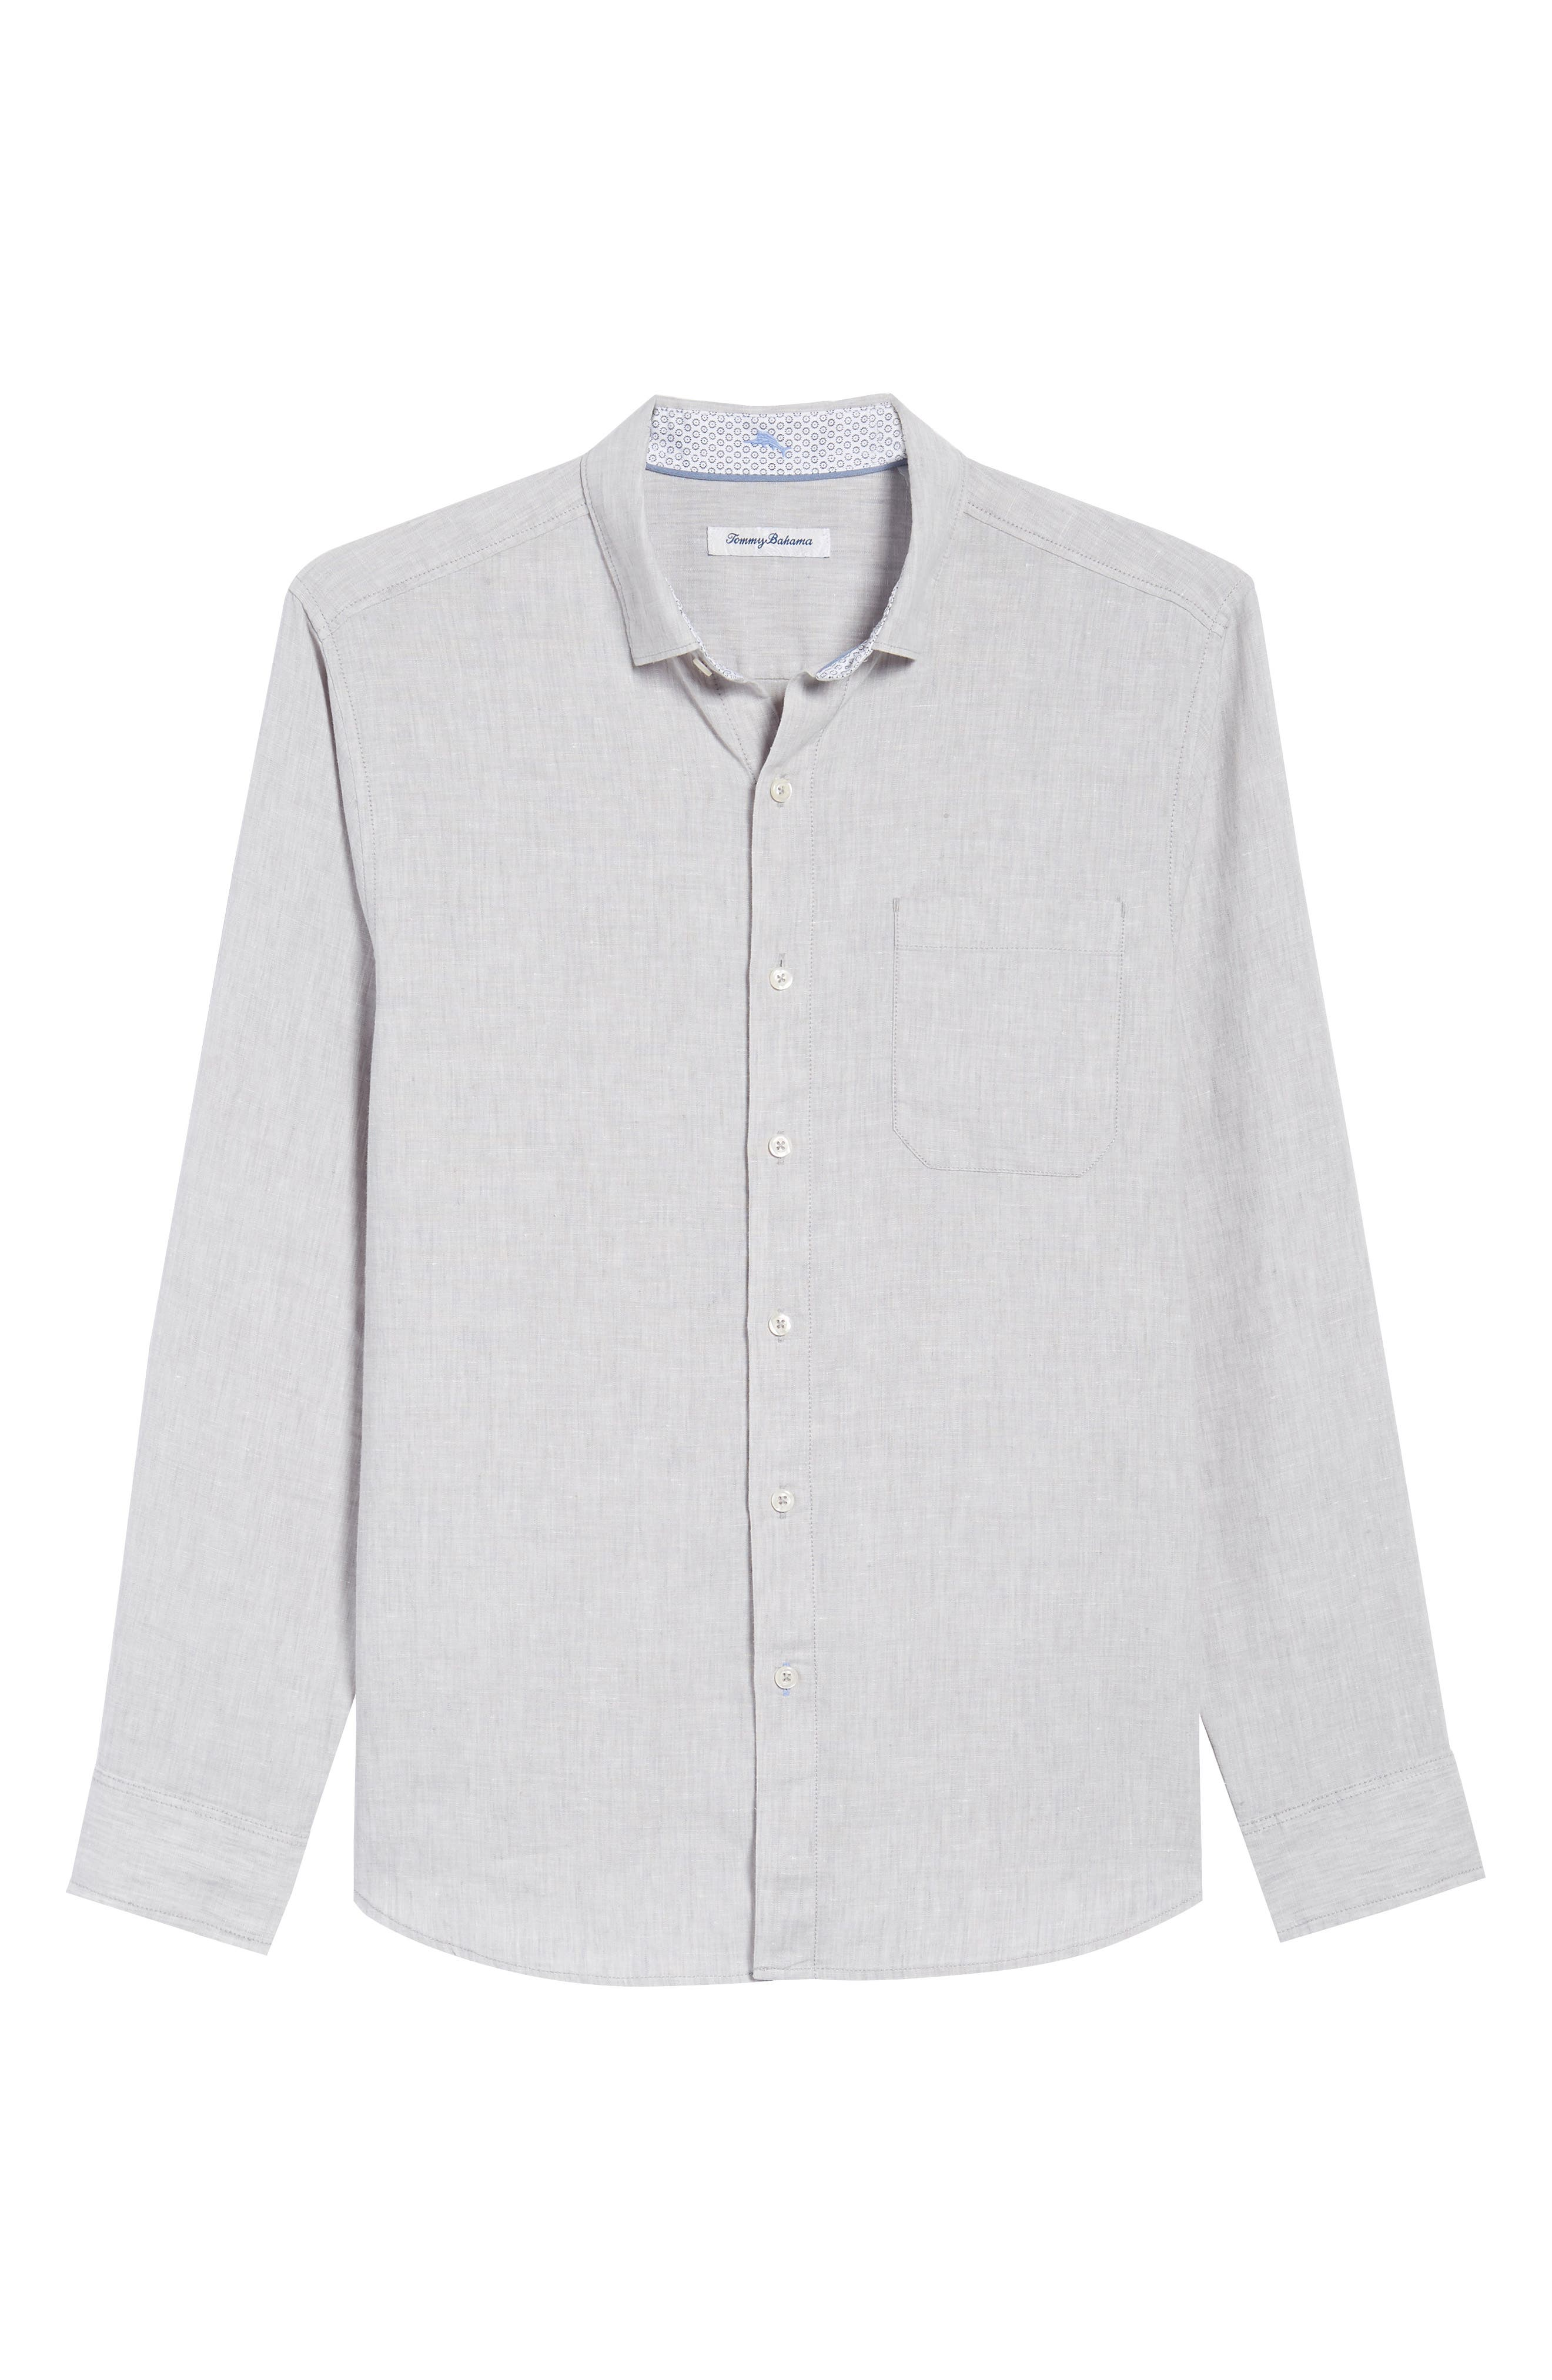 Lanai Tides Linen Blend Sport Shirt,                             Alternate thumbnail 6, color,                             020